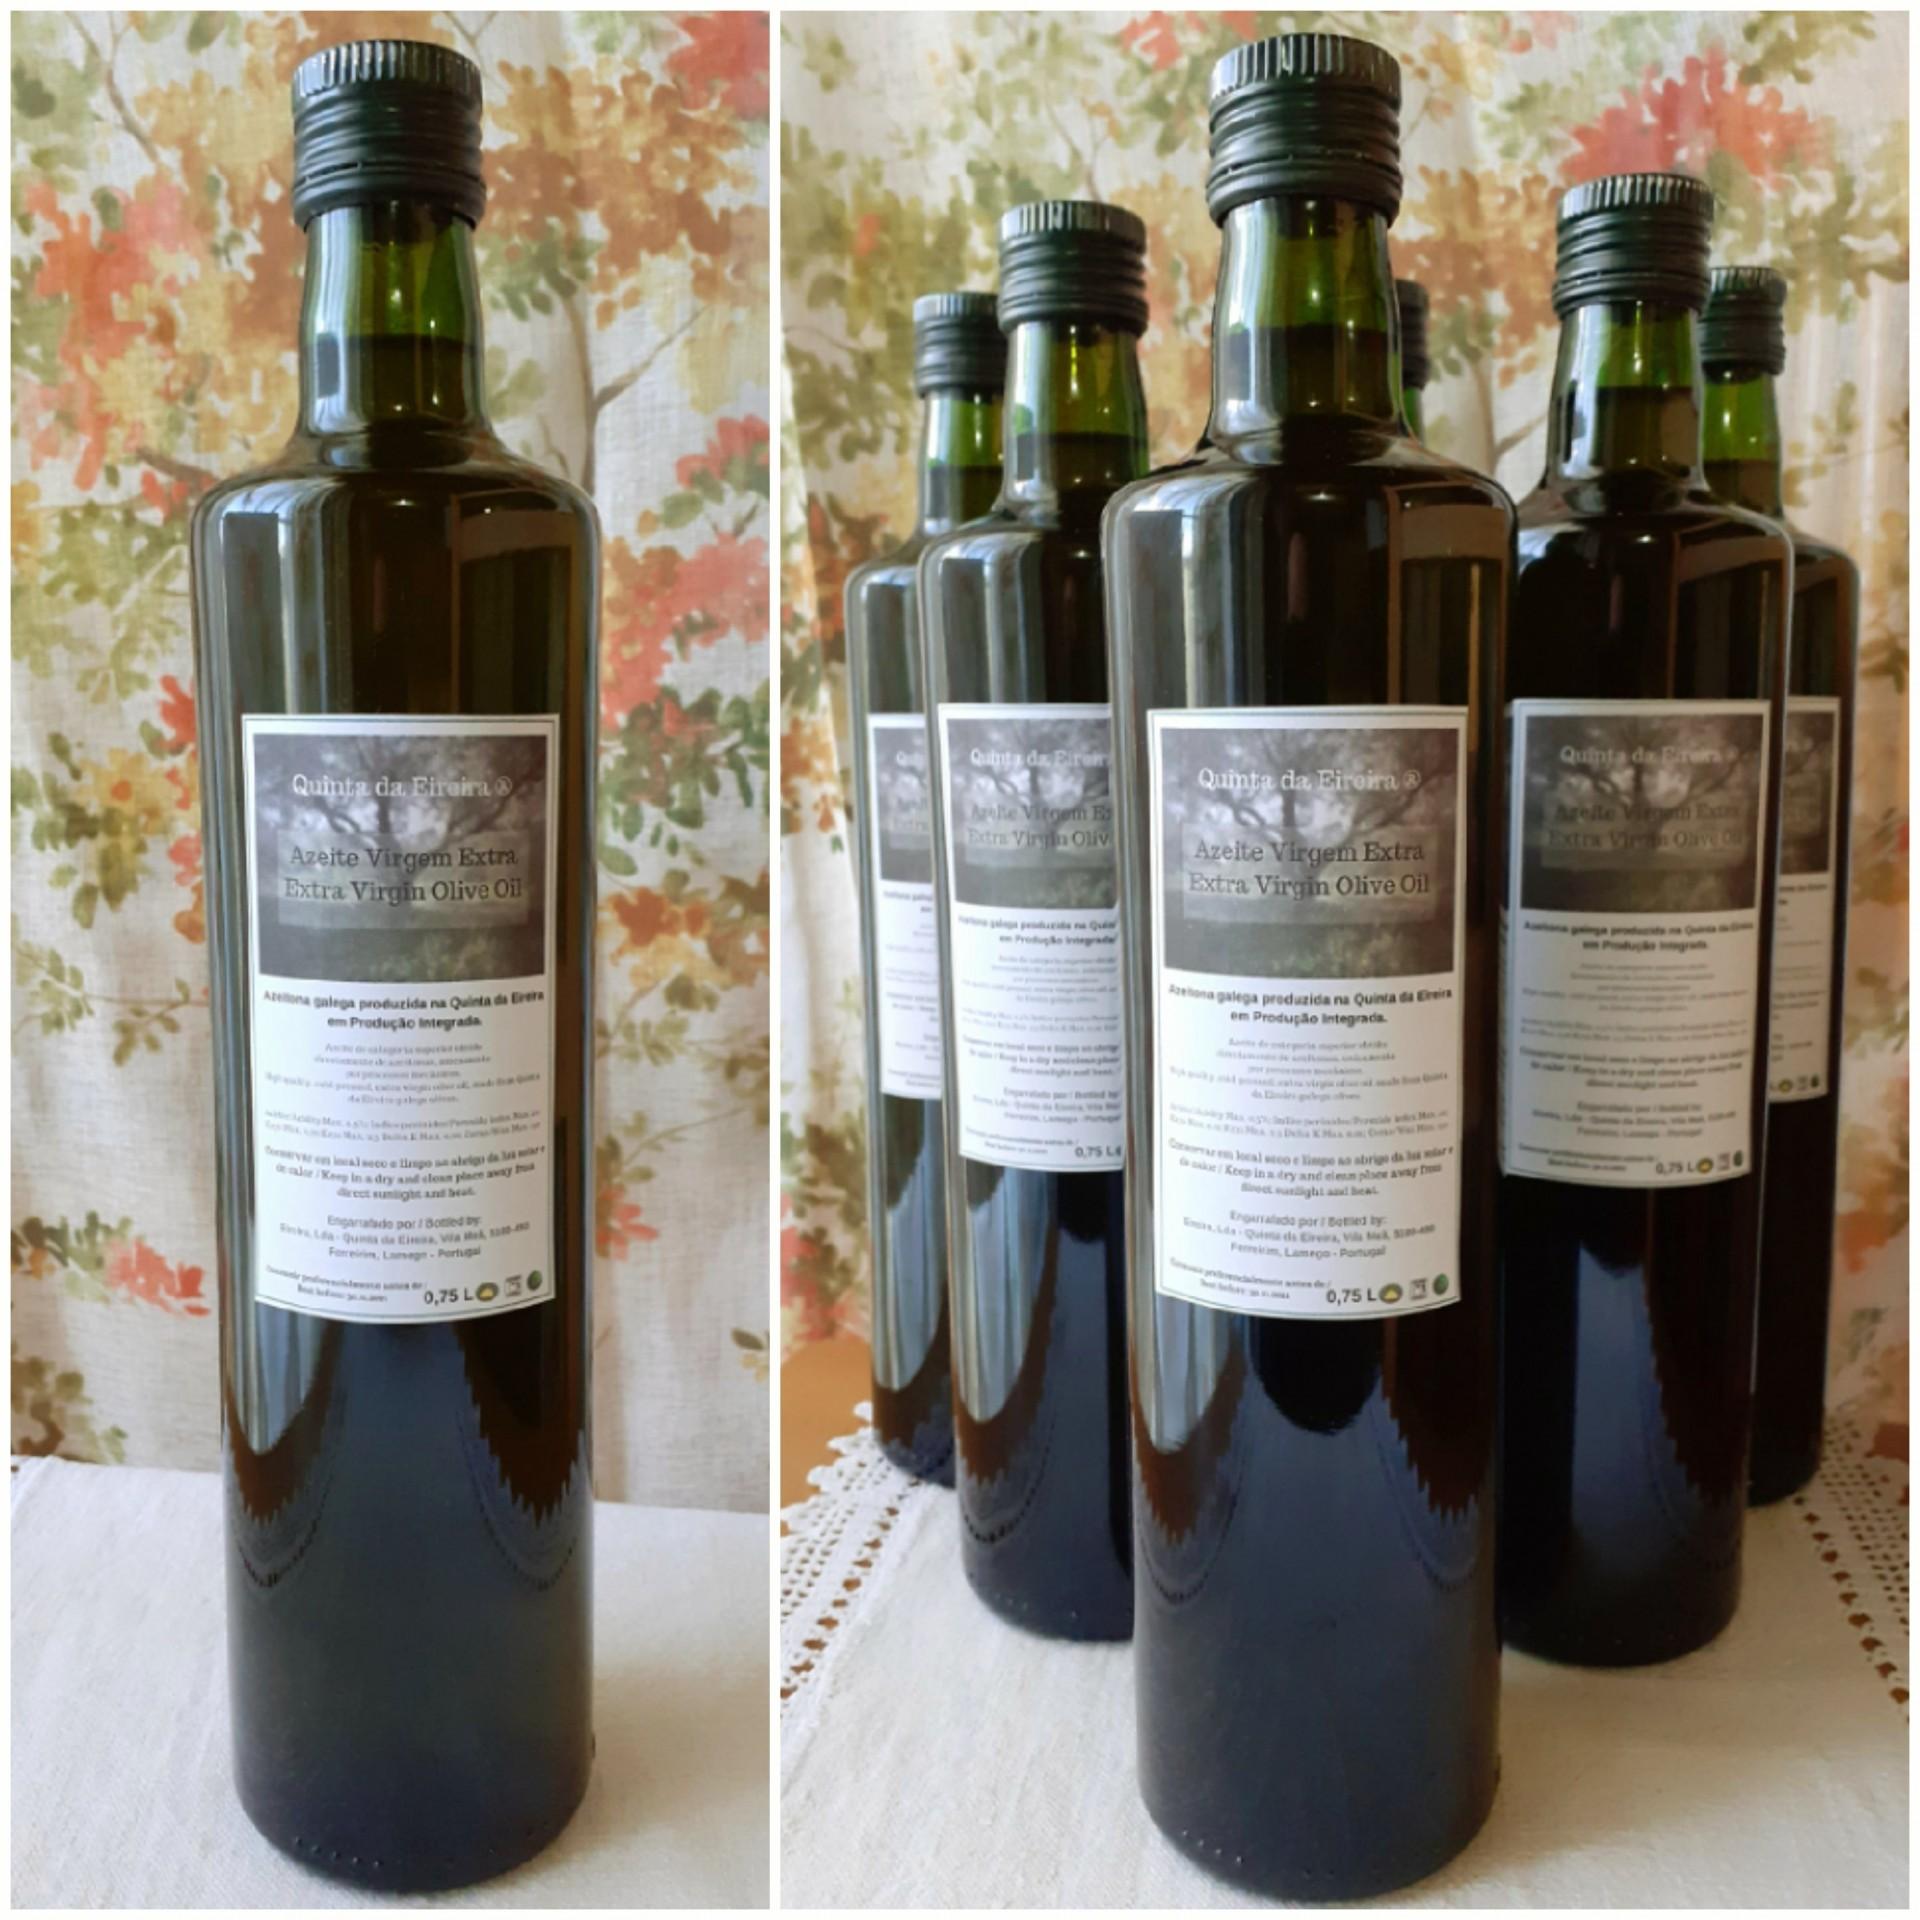 Azeite Virgem Extra 0.75 L